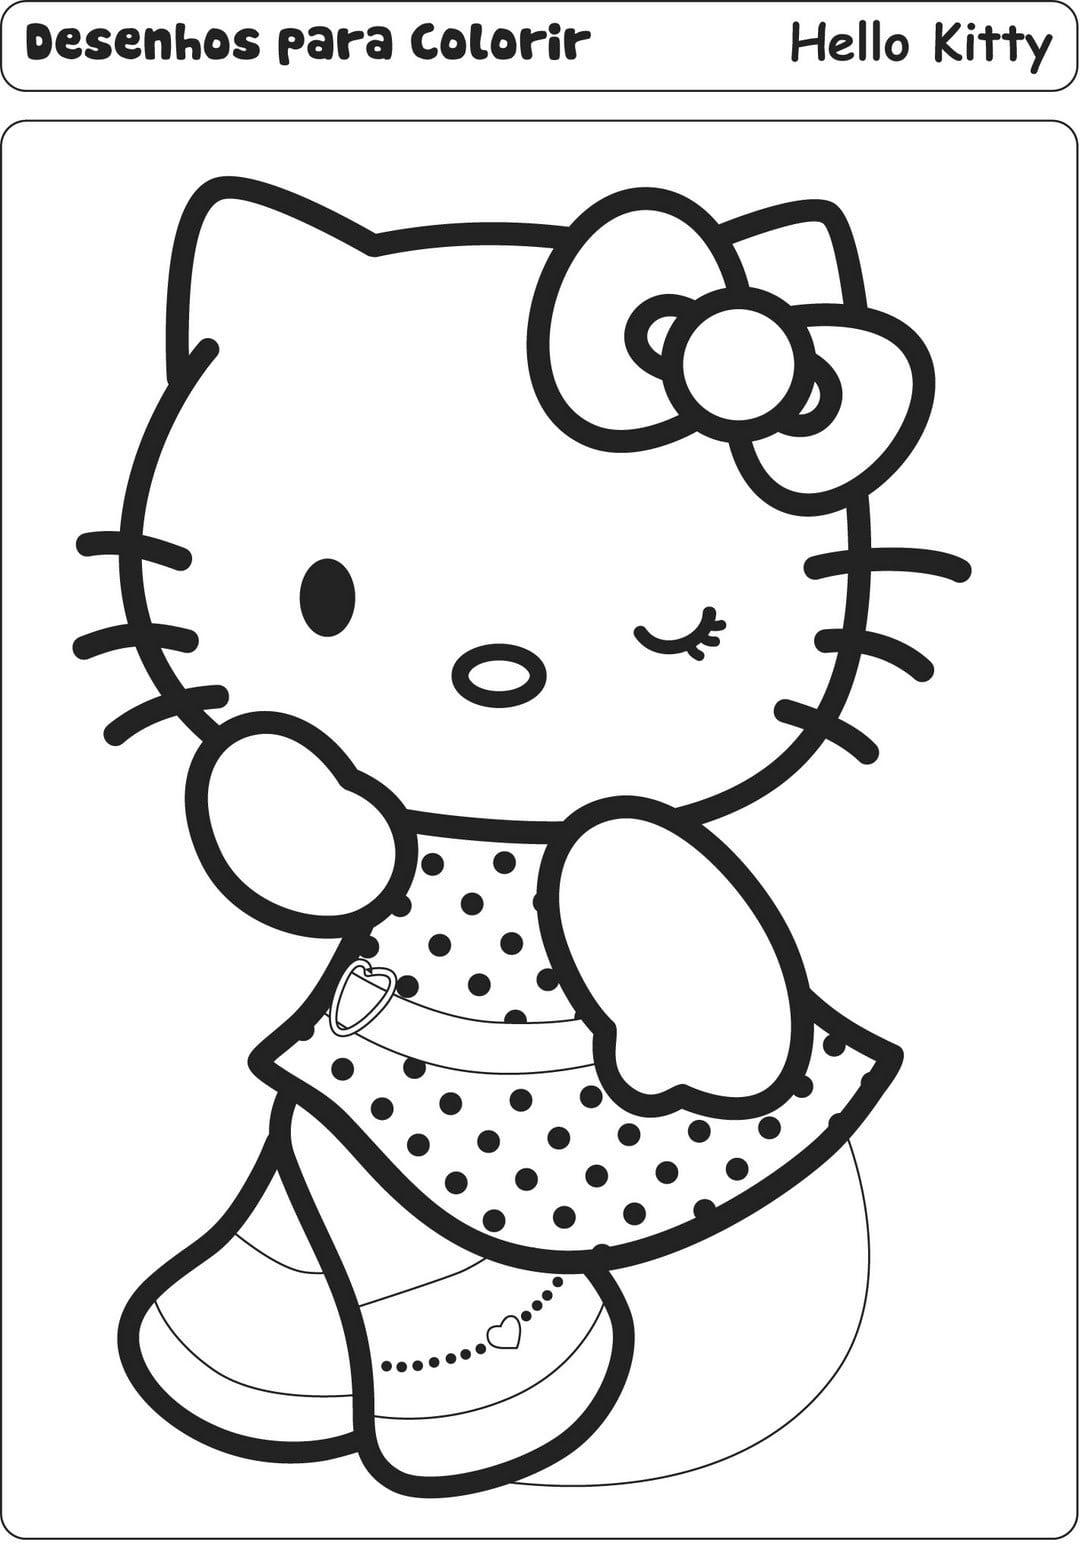 Imagens Para Colorir Da Hello Kitty – Pampekids Net